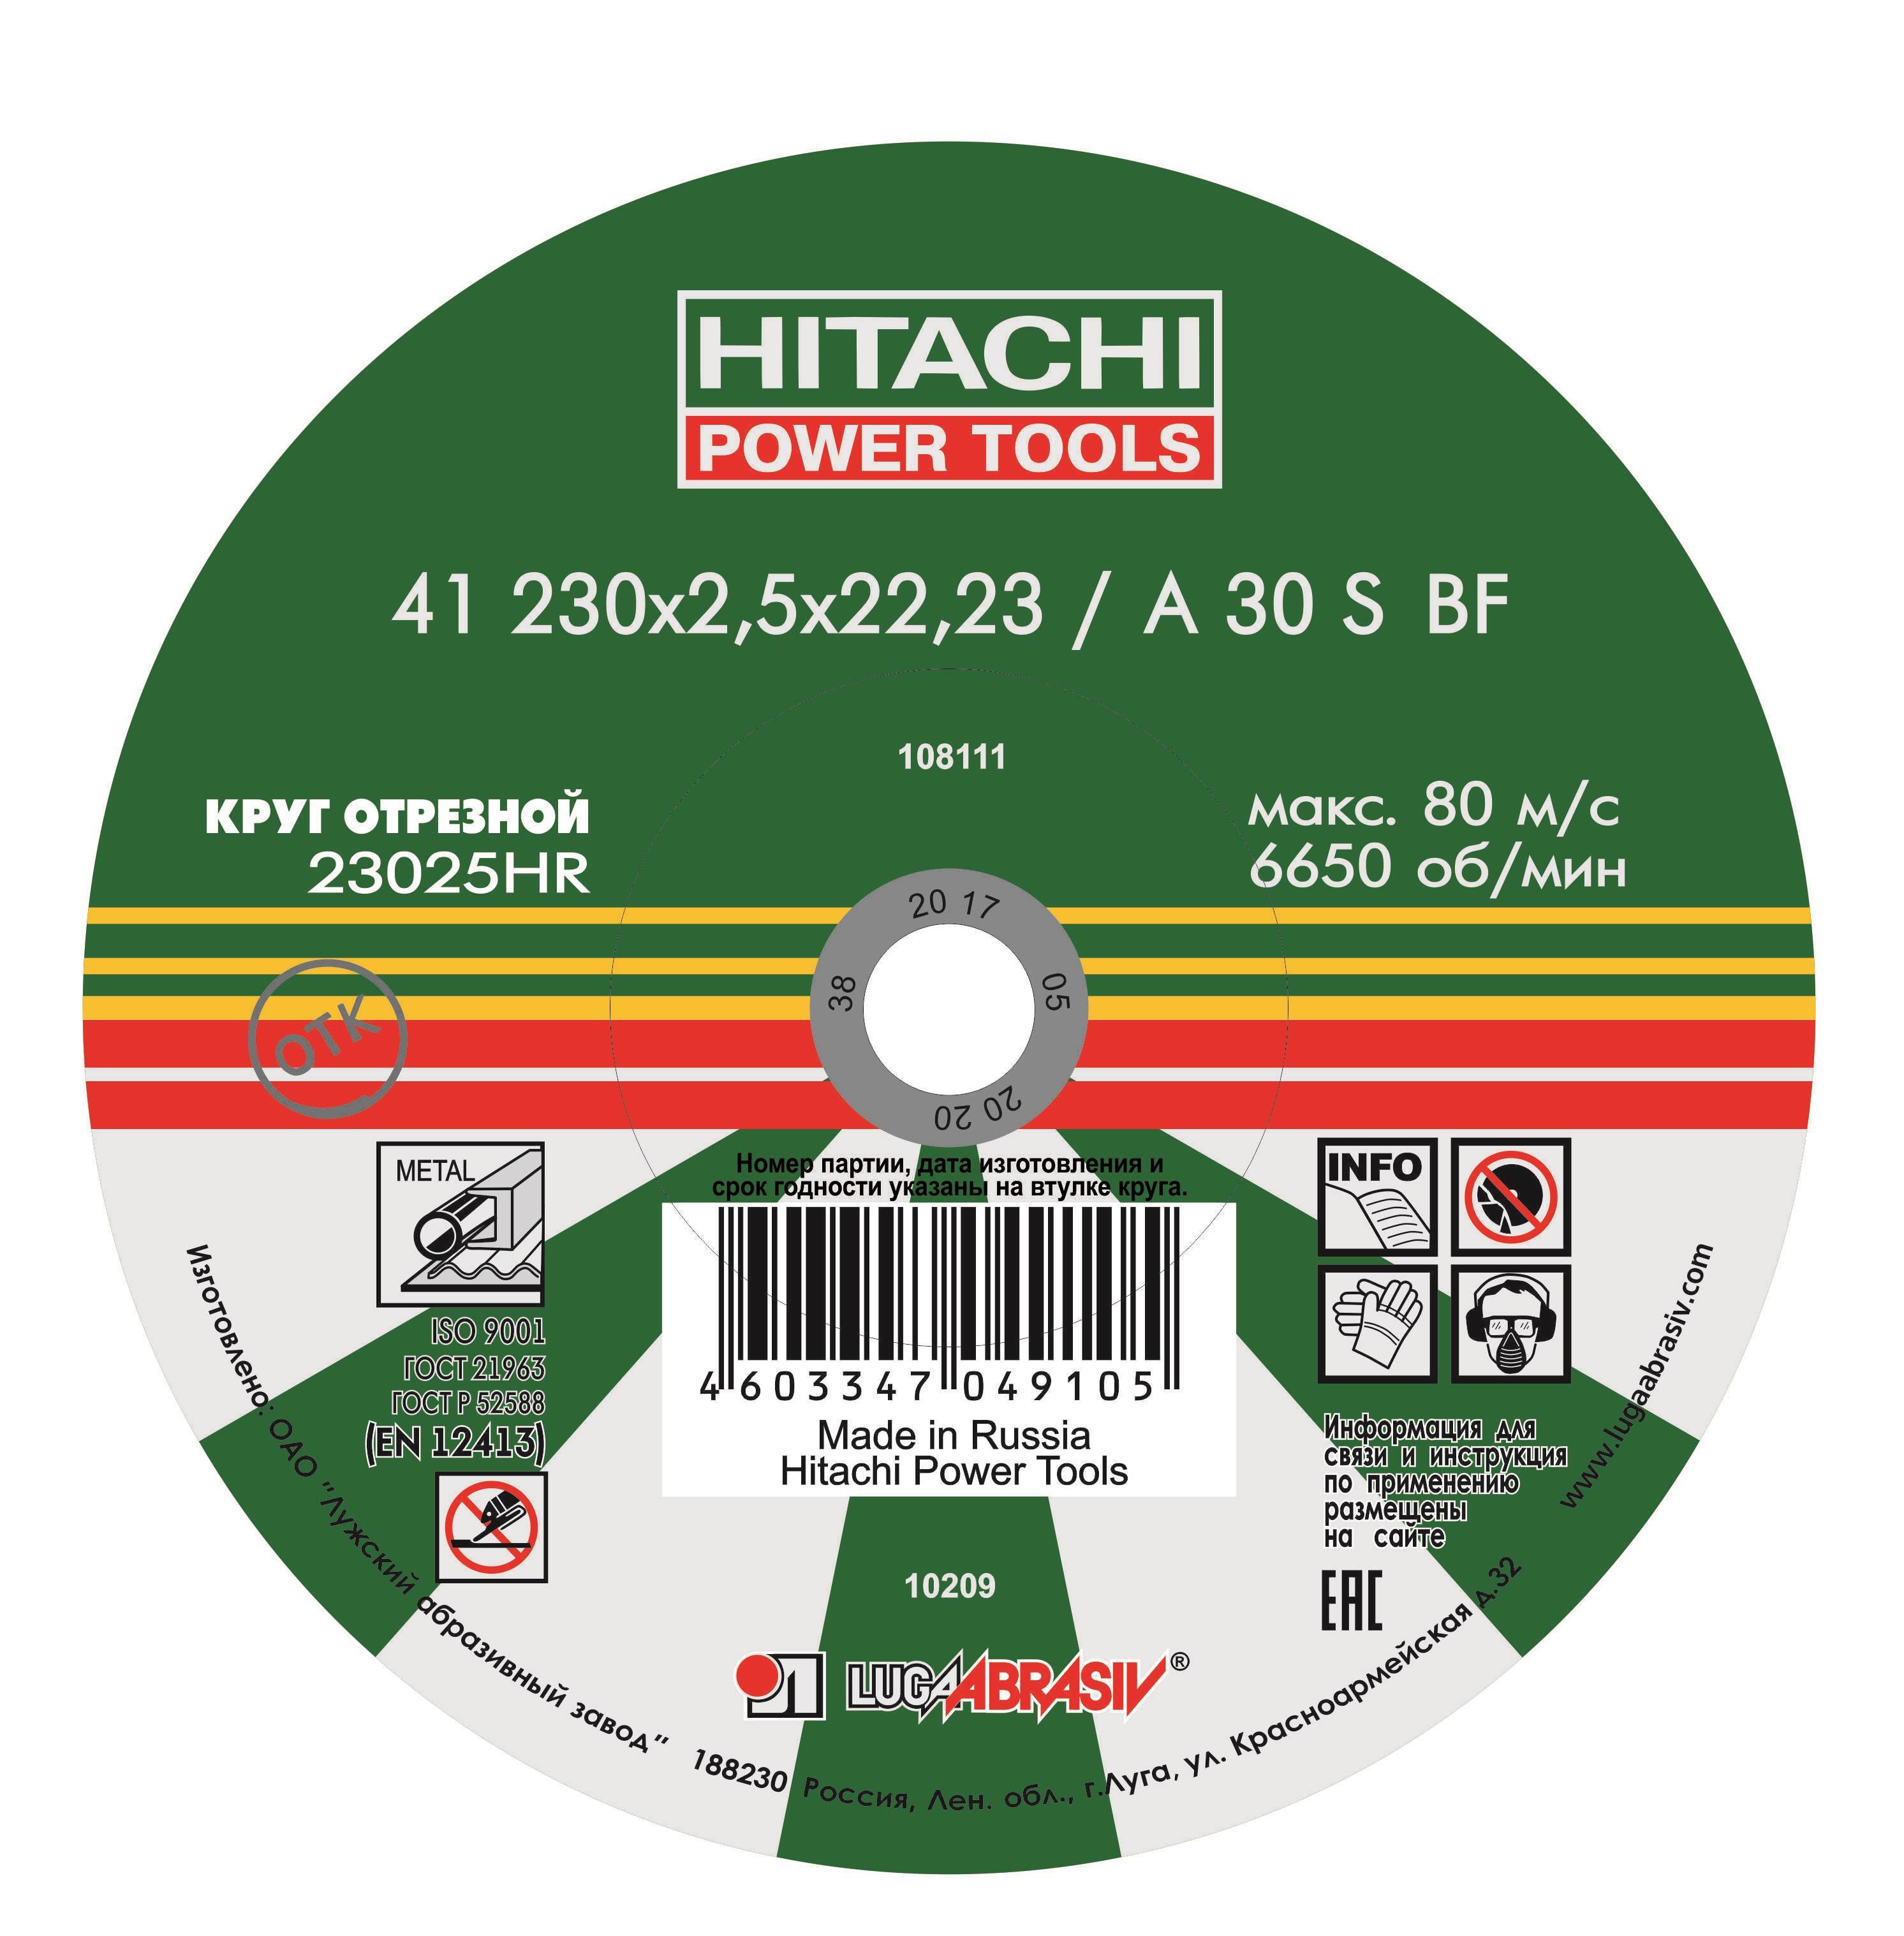 Круг отрезной Hitachi А24 230 Х 2,5 Х 22 по металлу 25шт круг отрезной hammer 150 x 2 0 x 22 по металлу коробка 200шт